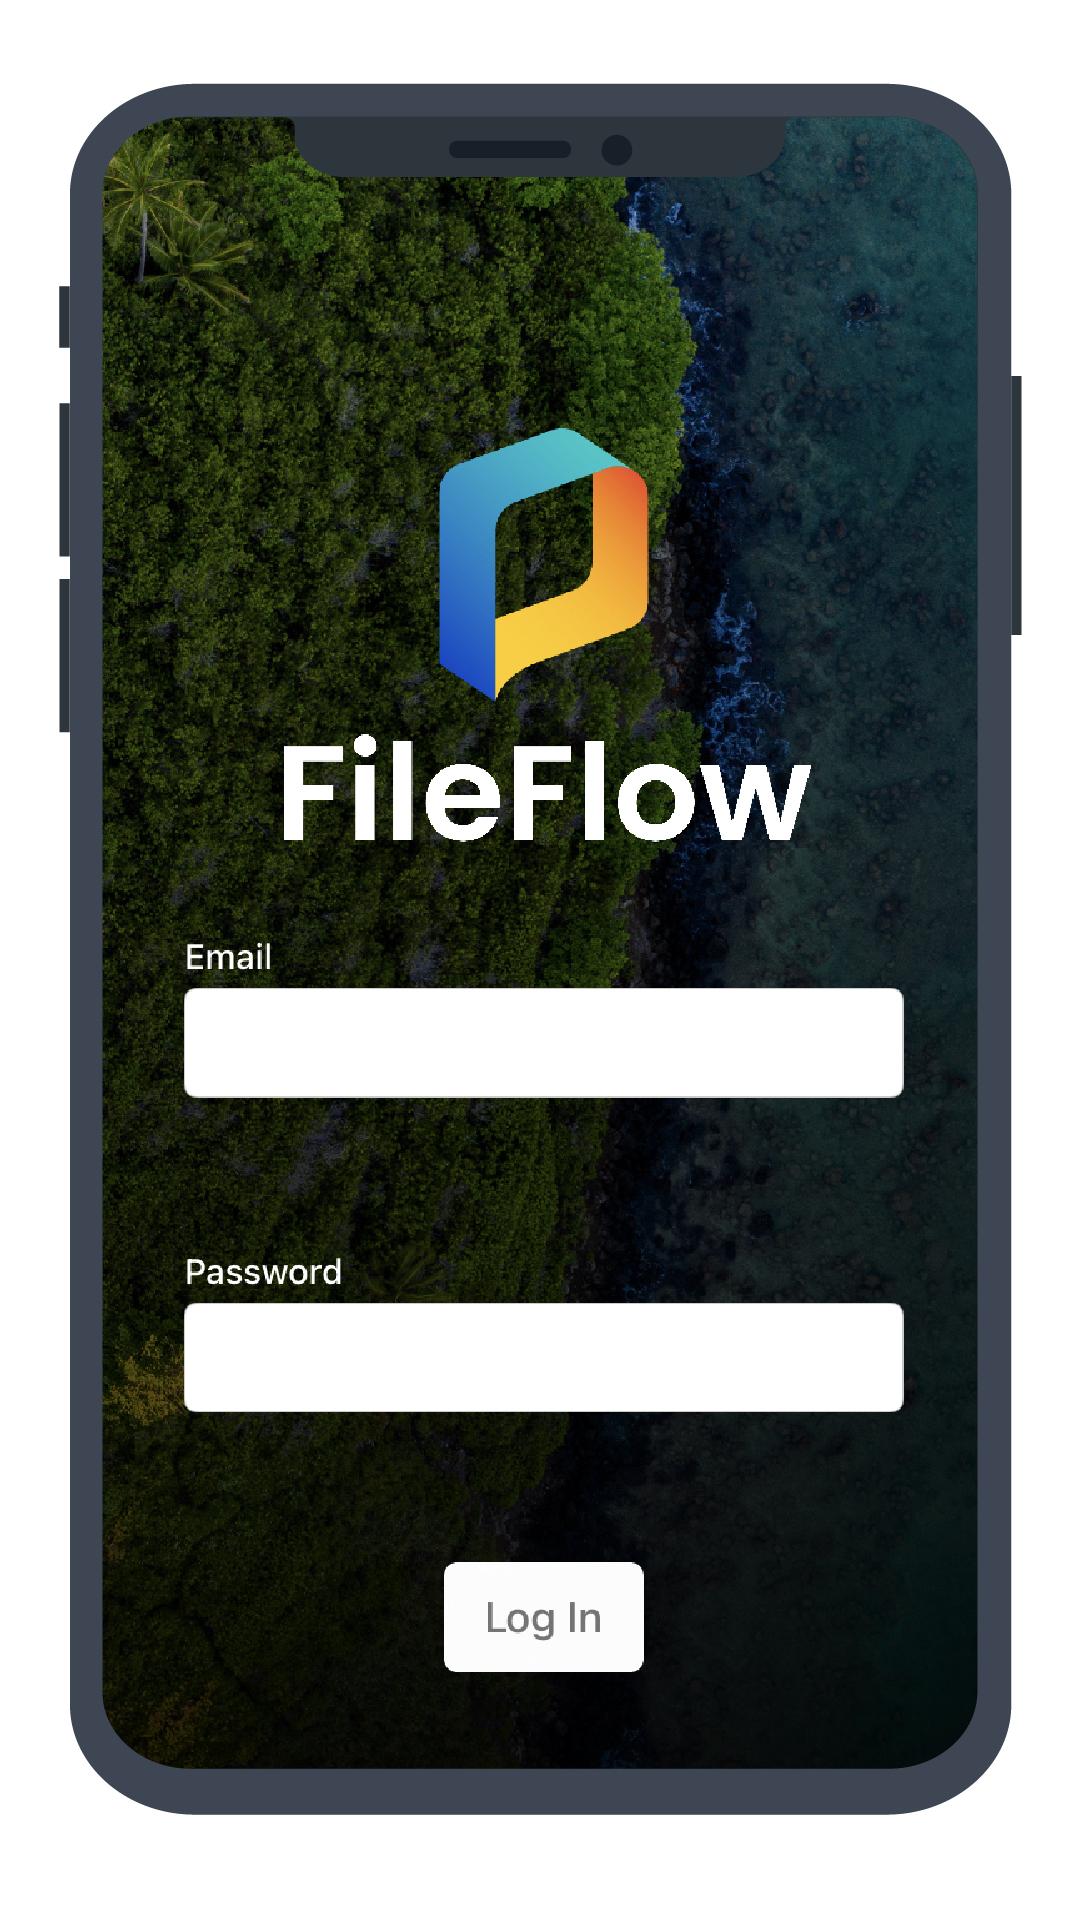 FileFlow Mobile App Login